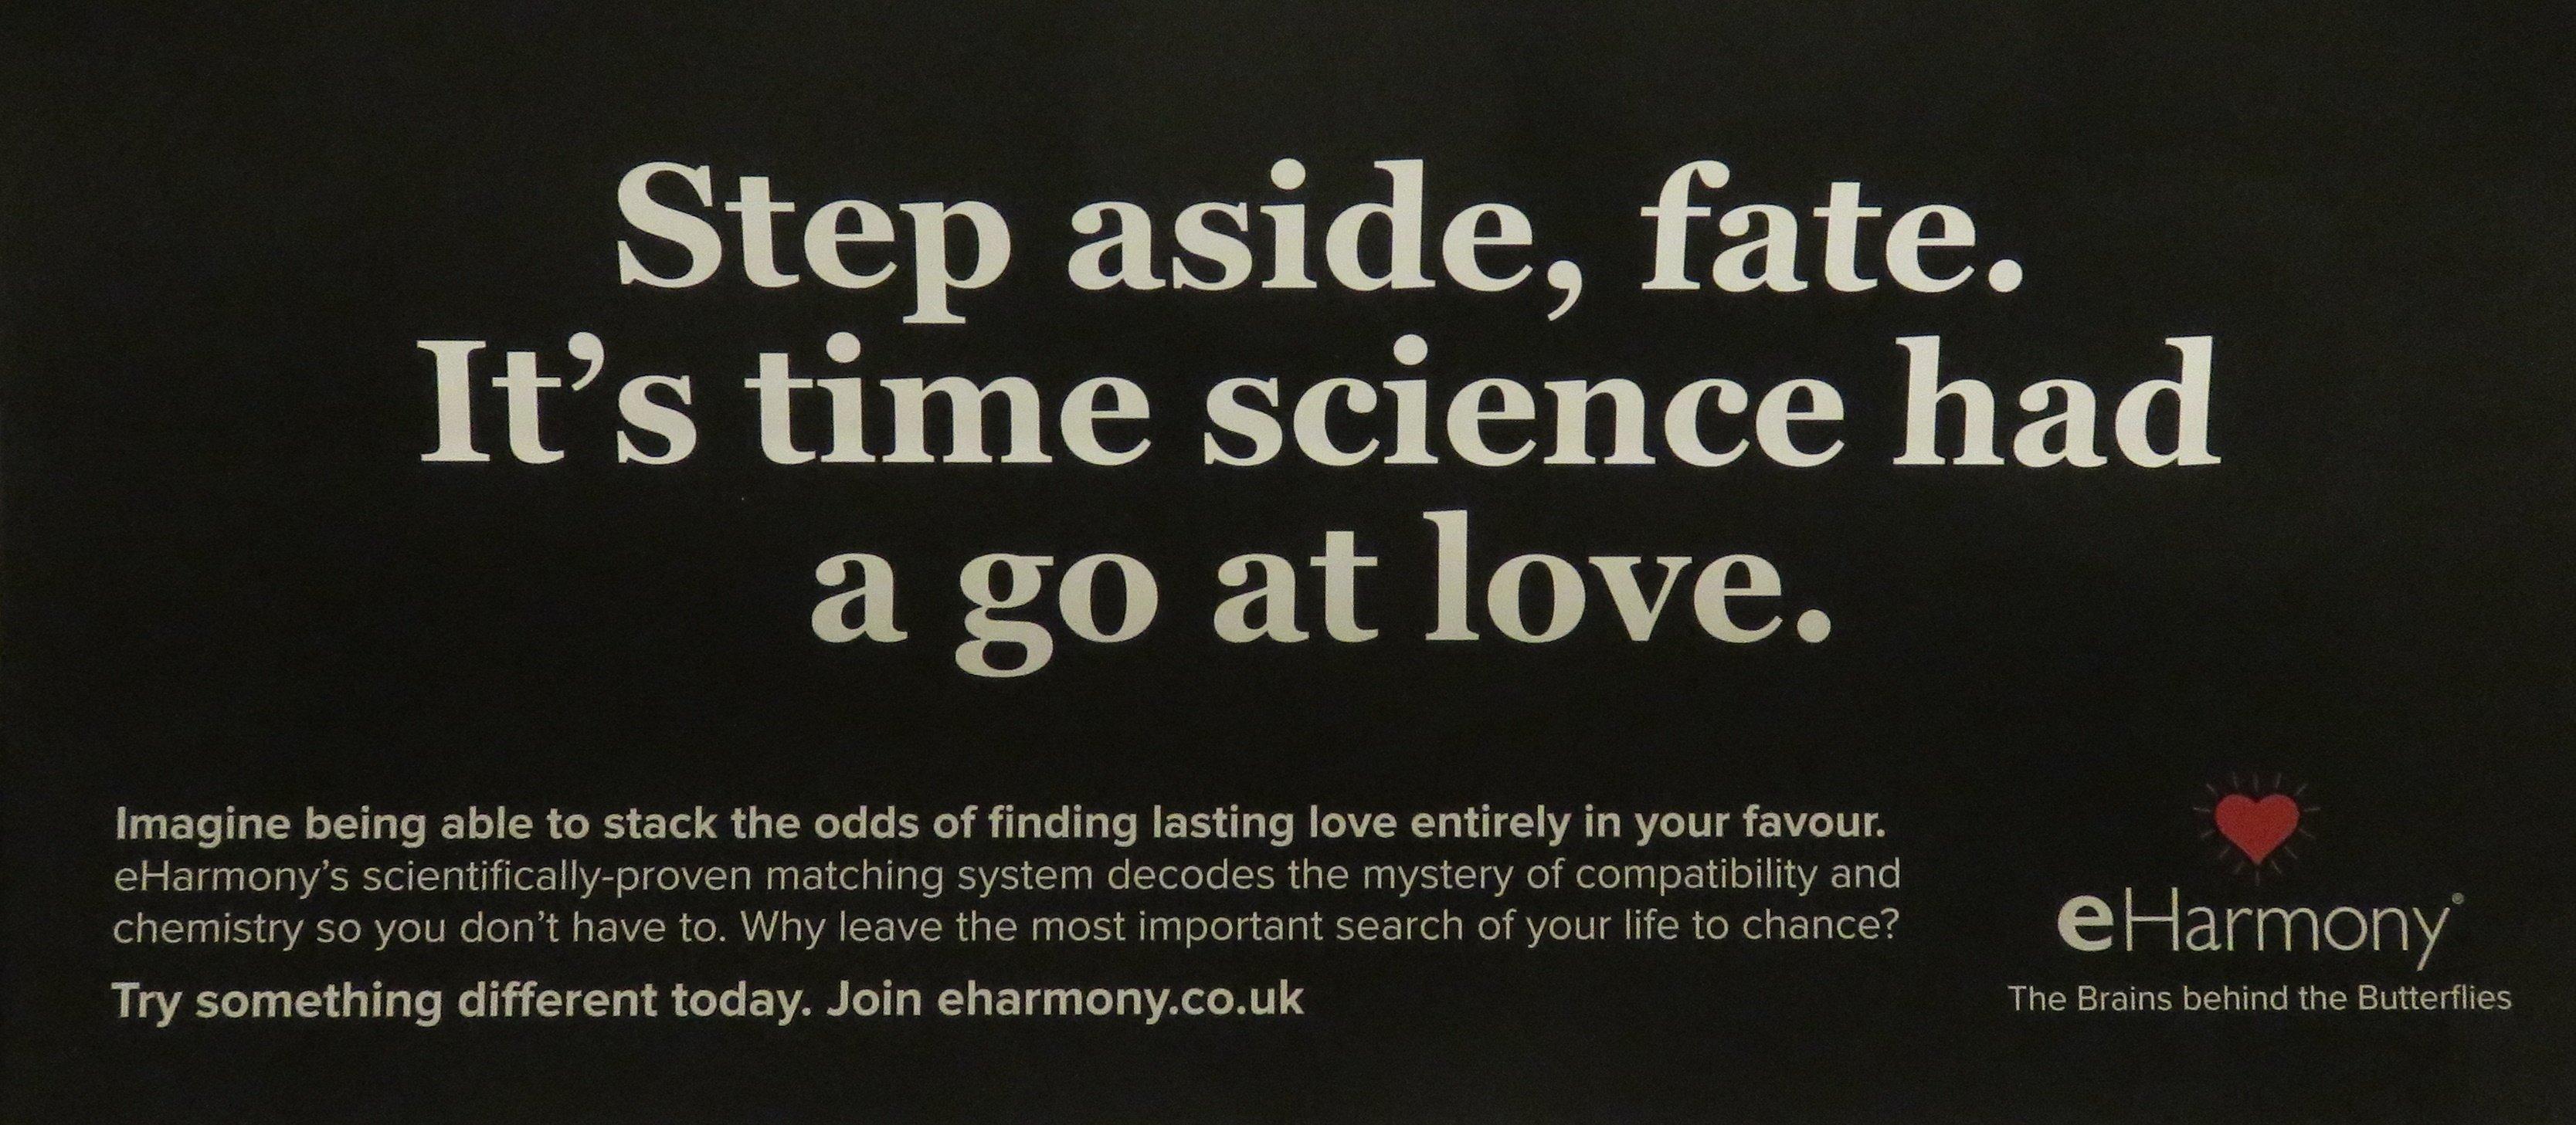 Dating websites like eharmony